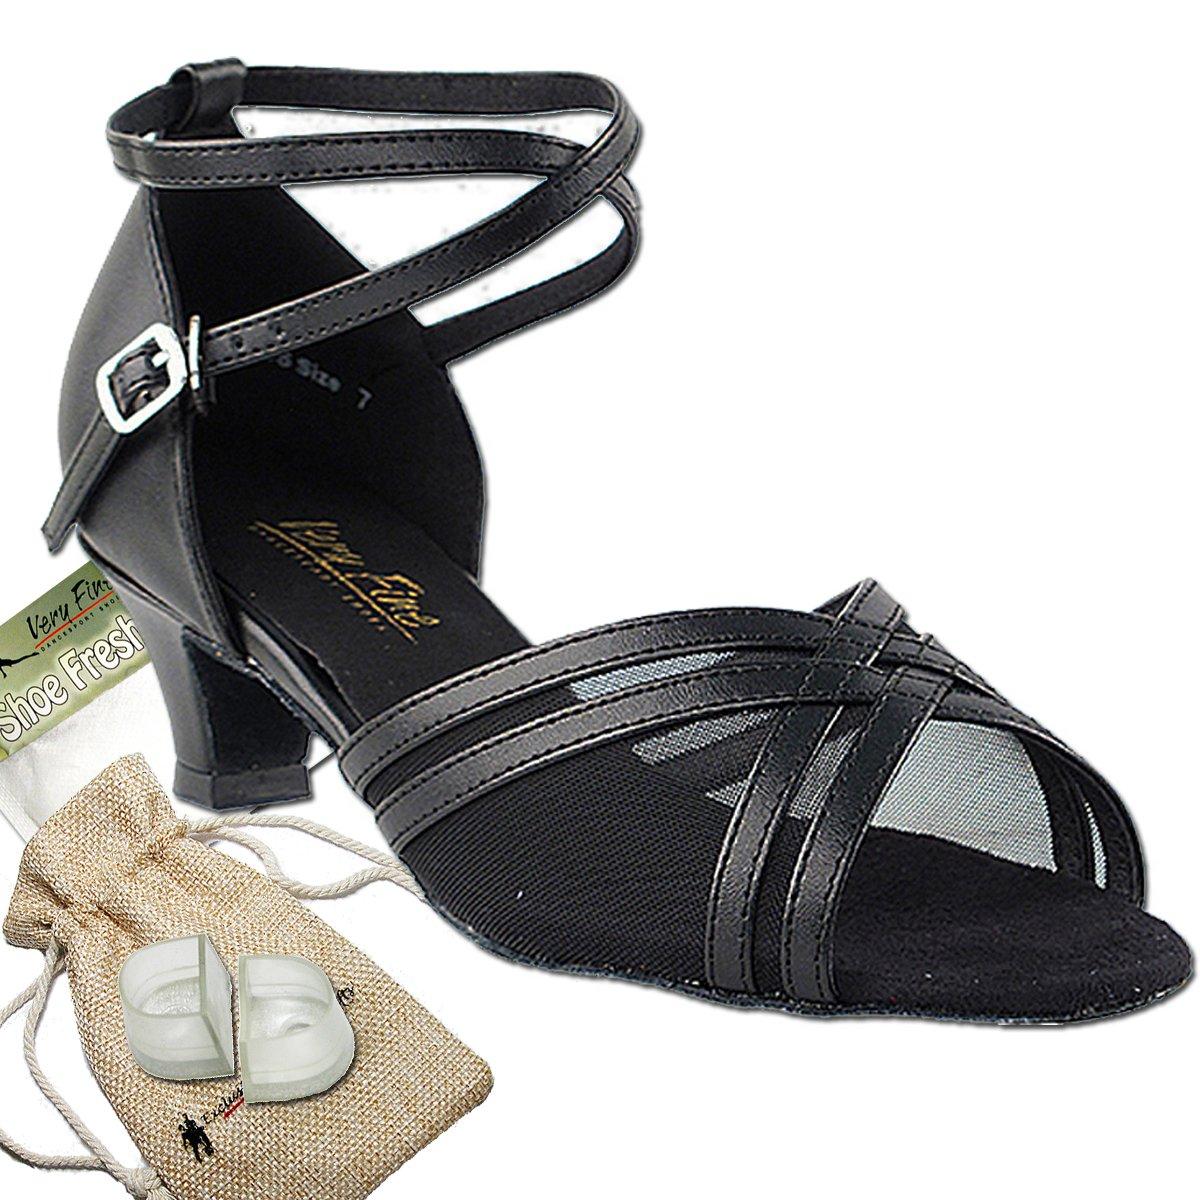 Women's Ballroom Dance Shoes Salsa Latin Practice Dance Shoes Black Leather & Black Mesh 5017EB Comfortable - Very Fine 1.3'' Heel 8.5 M US [Bundle of 5]